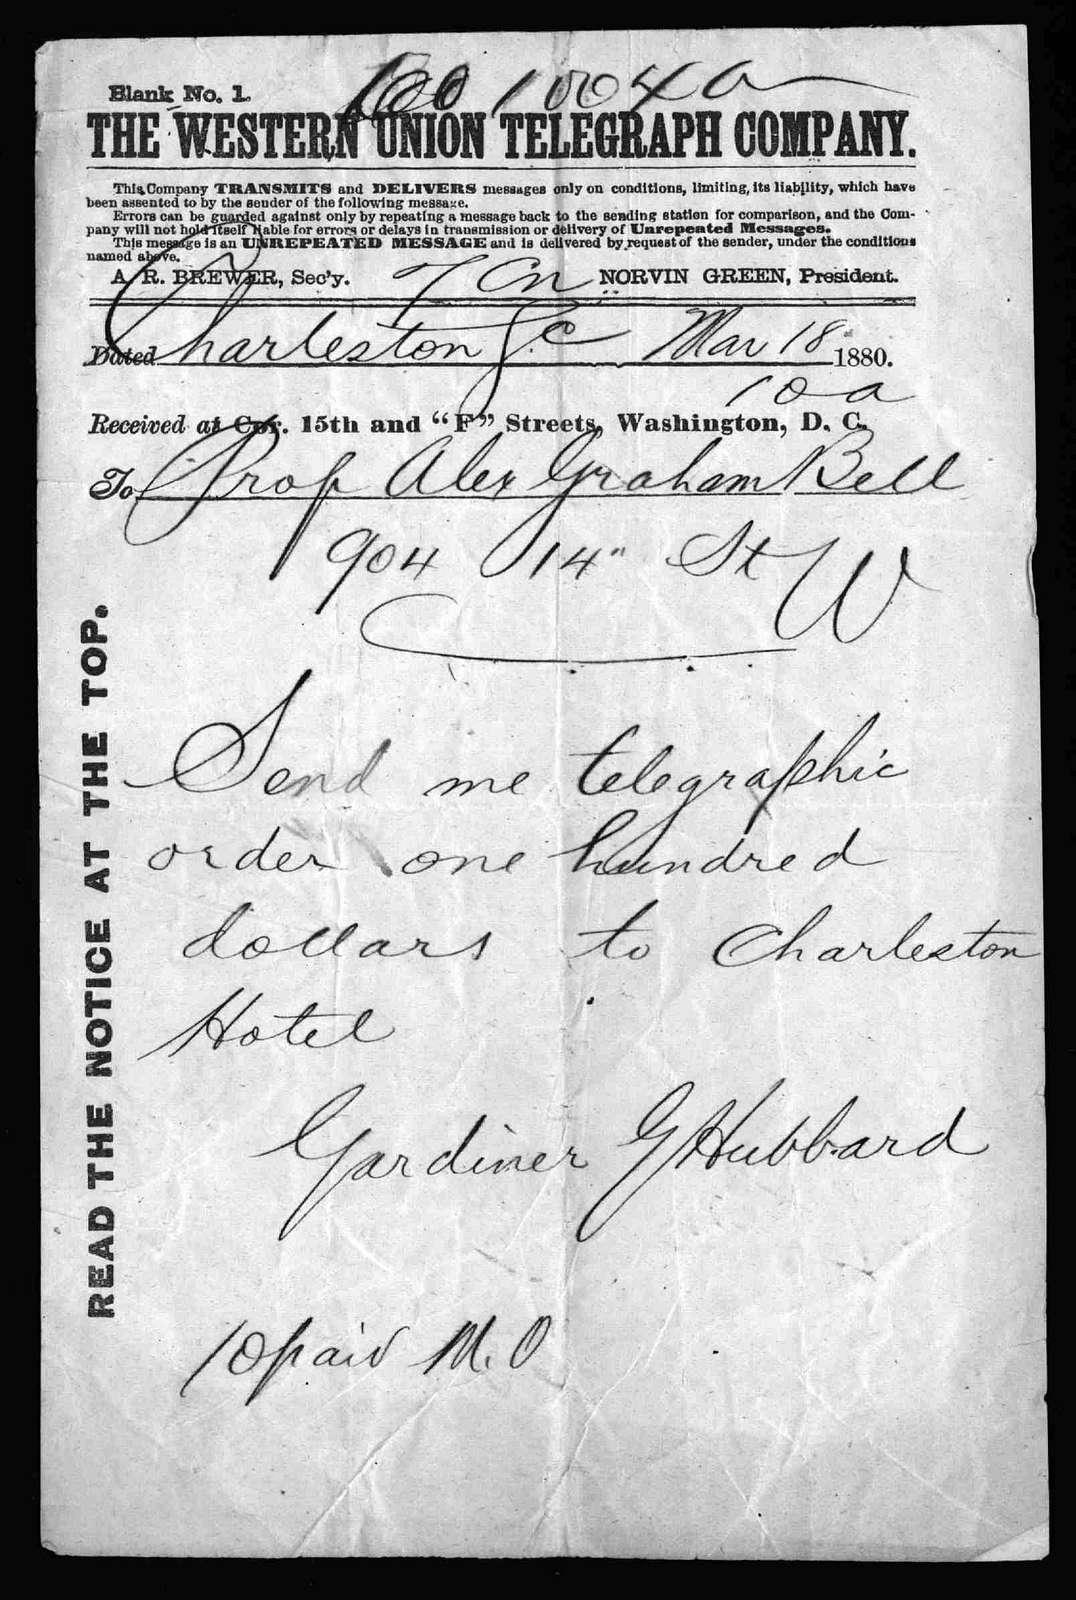 Telegram from Gardiner Greene Hubbard to Alexander Graham Bell, March 18, 1880